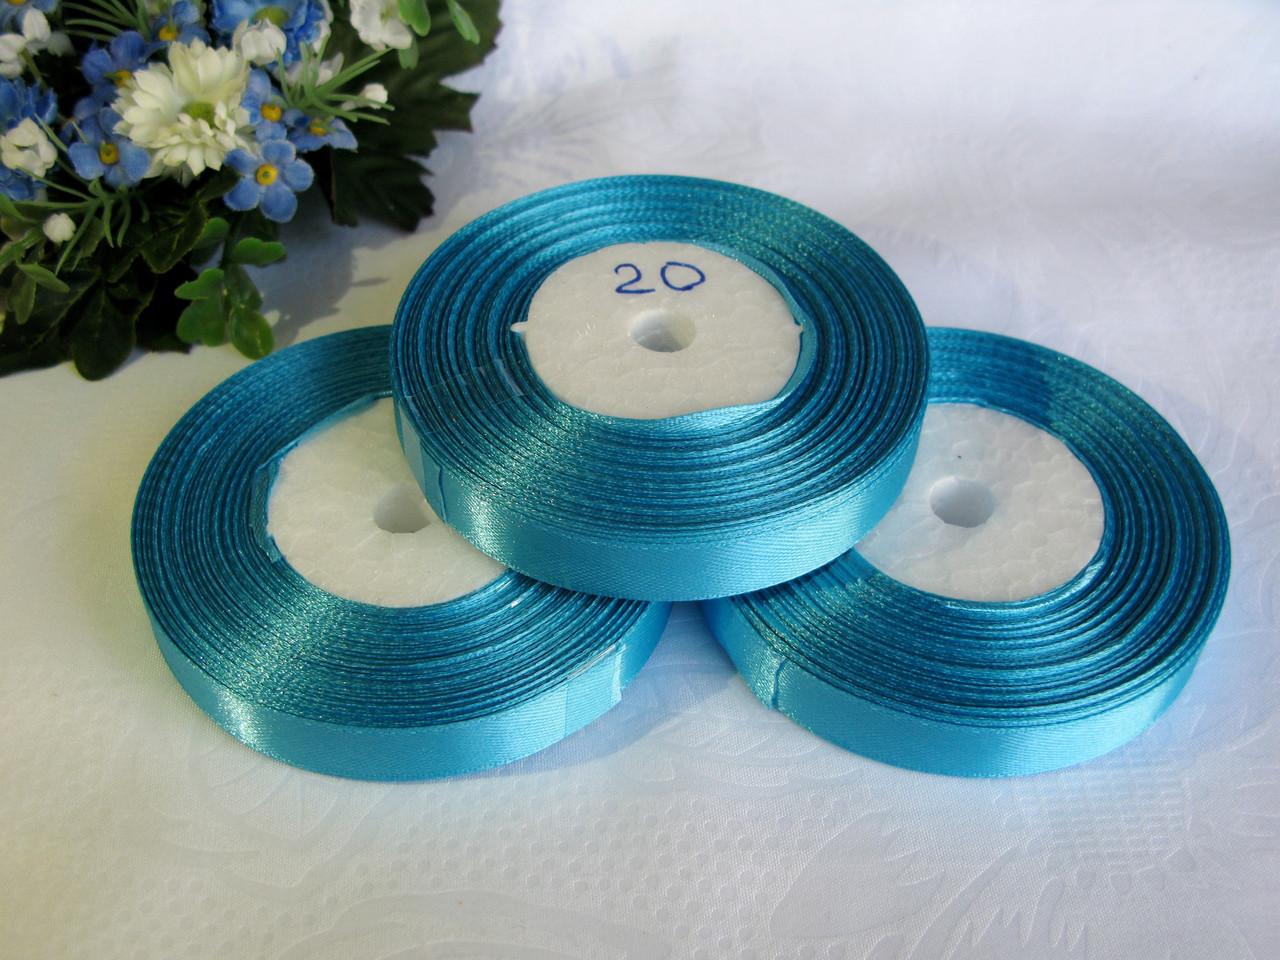 Атласная лента 1.2 см цвет - голубой (20)  бобина 23 м